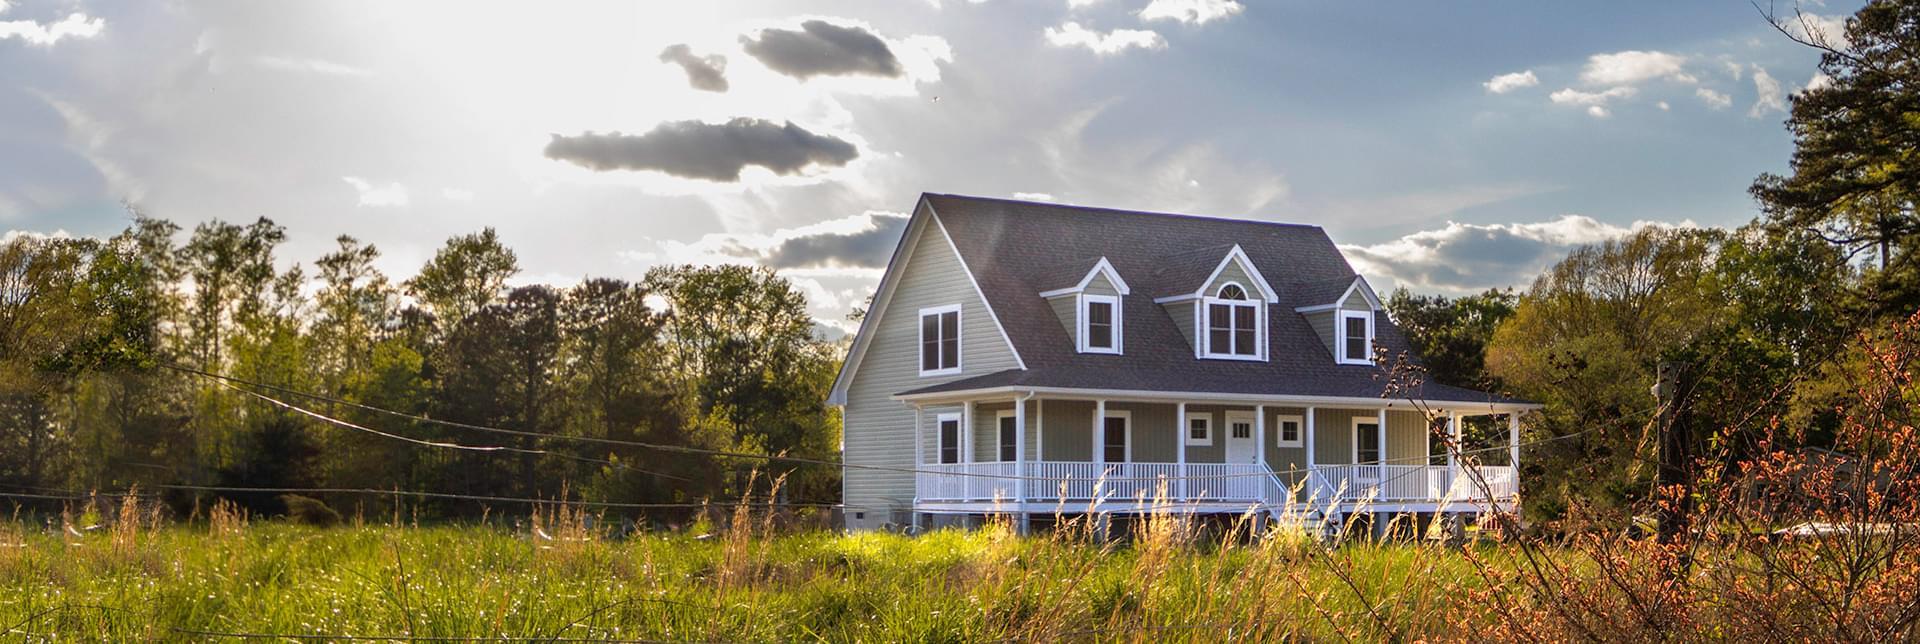 New Homes in Bertie County NC